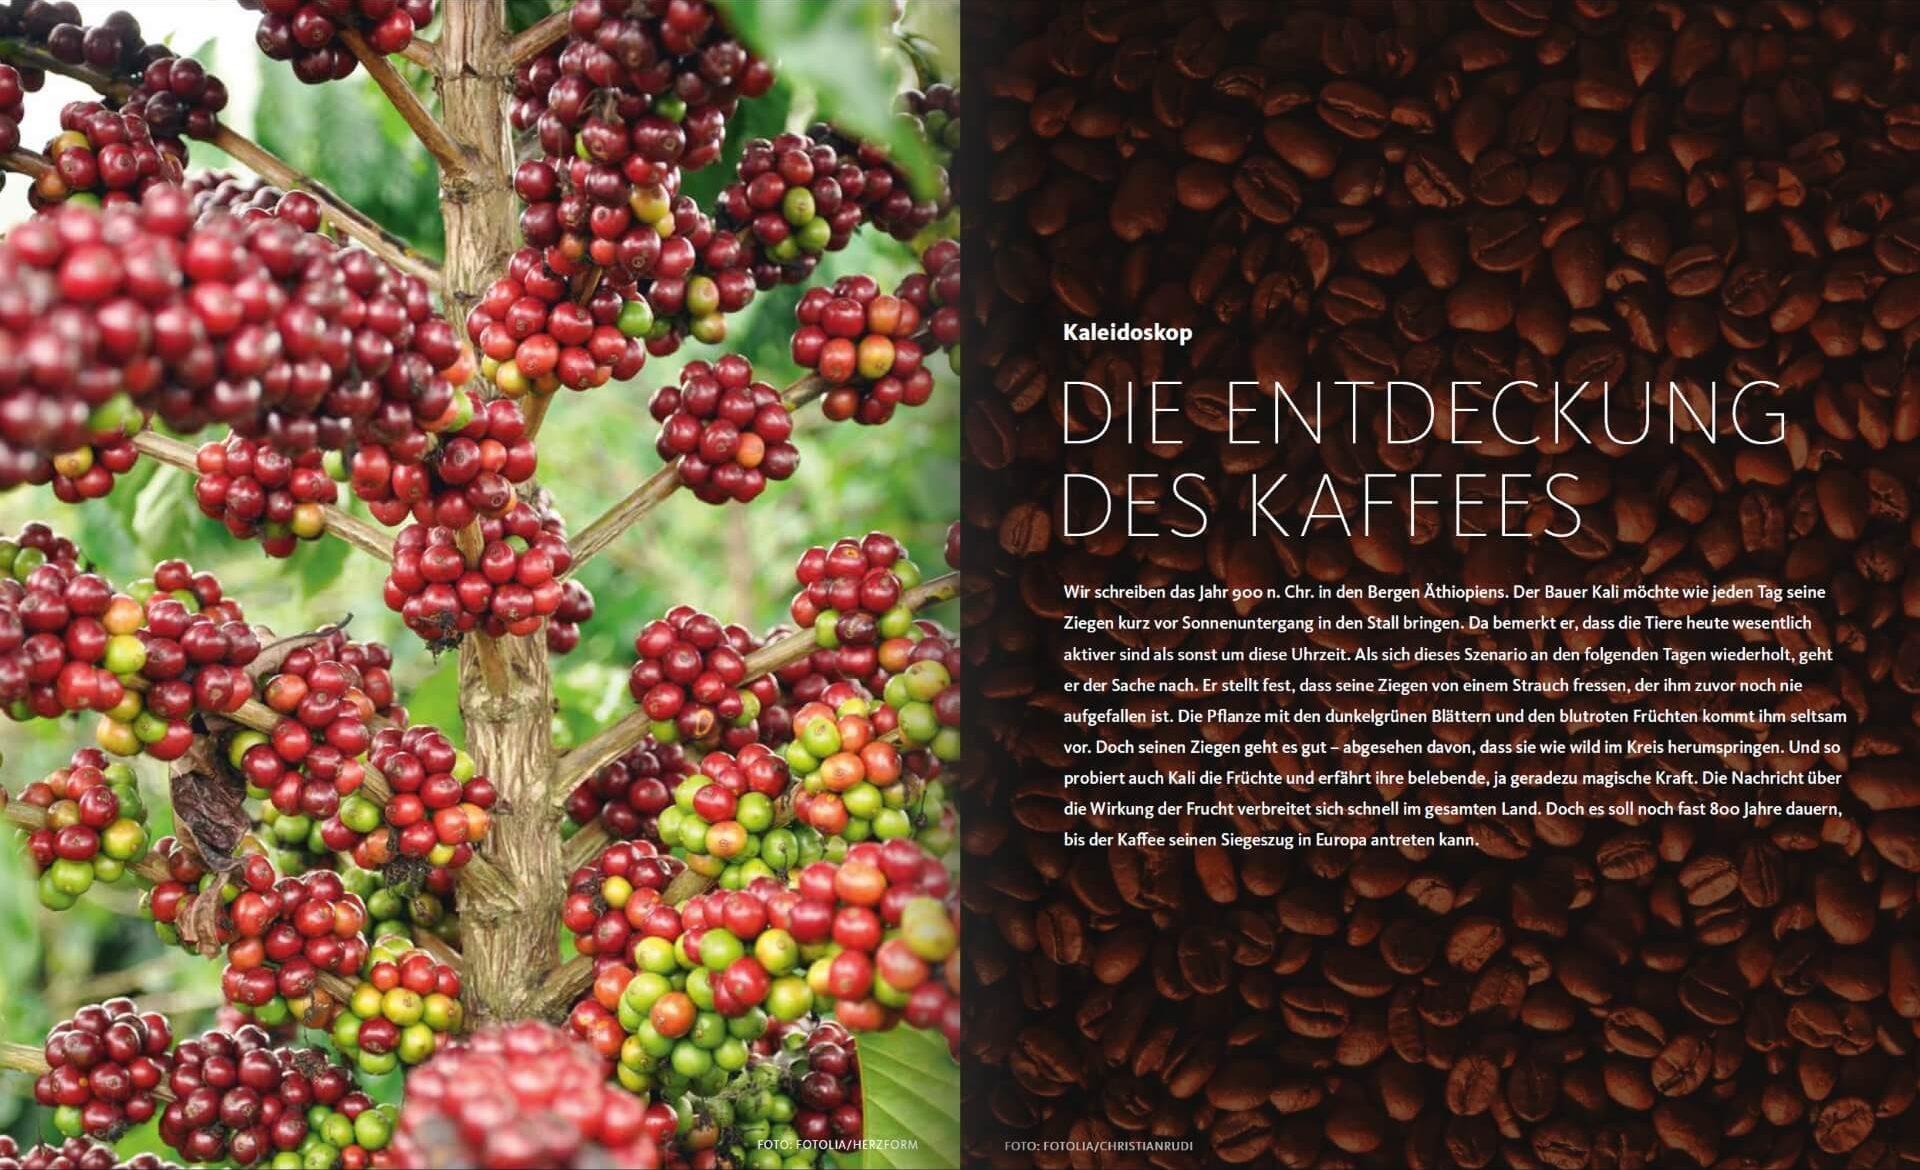 GARTENDESIGN INSPIRATION 4/2017: Entdeckung des Kaffees